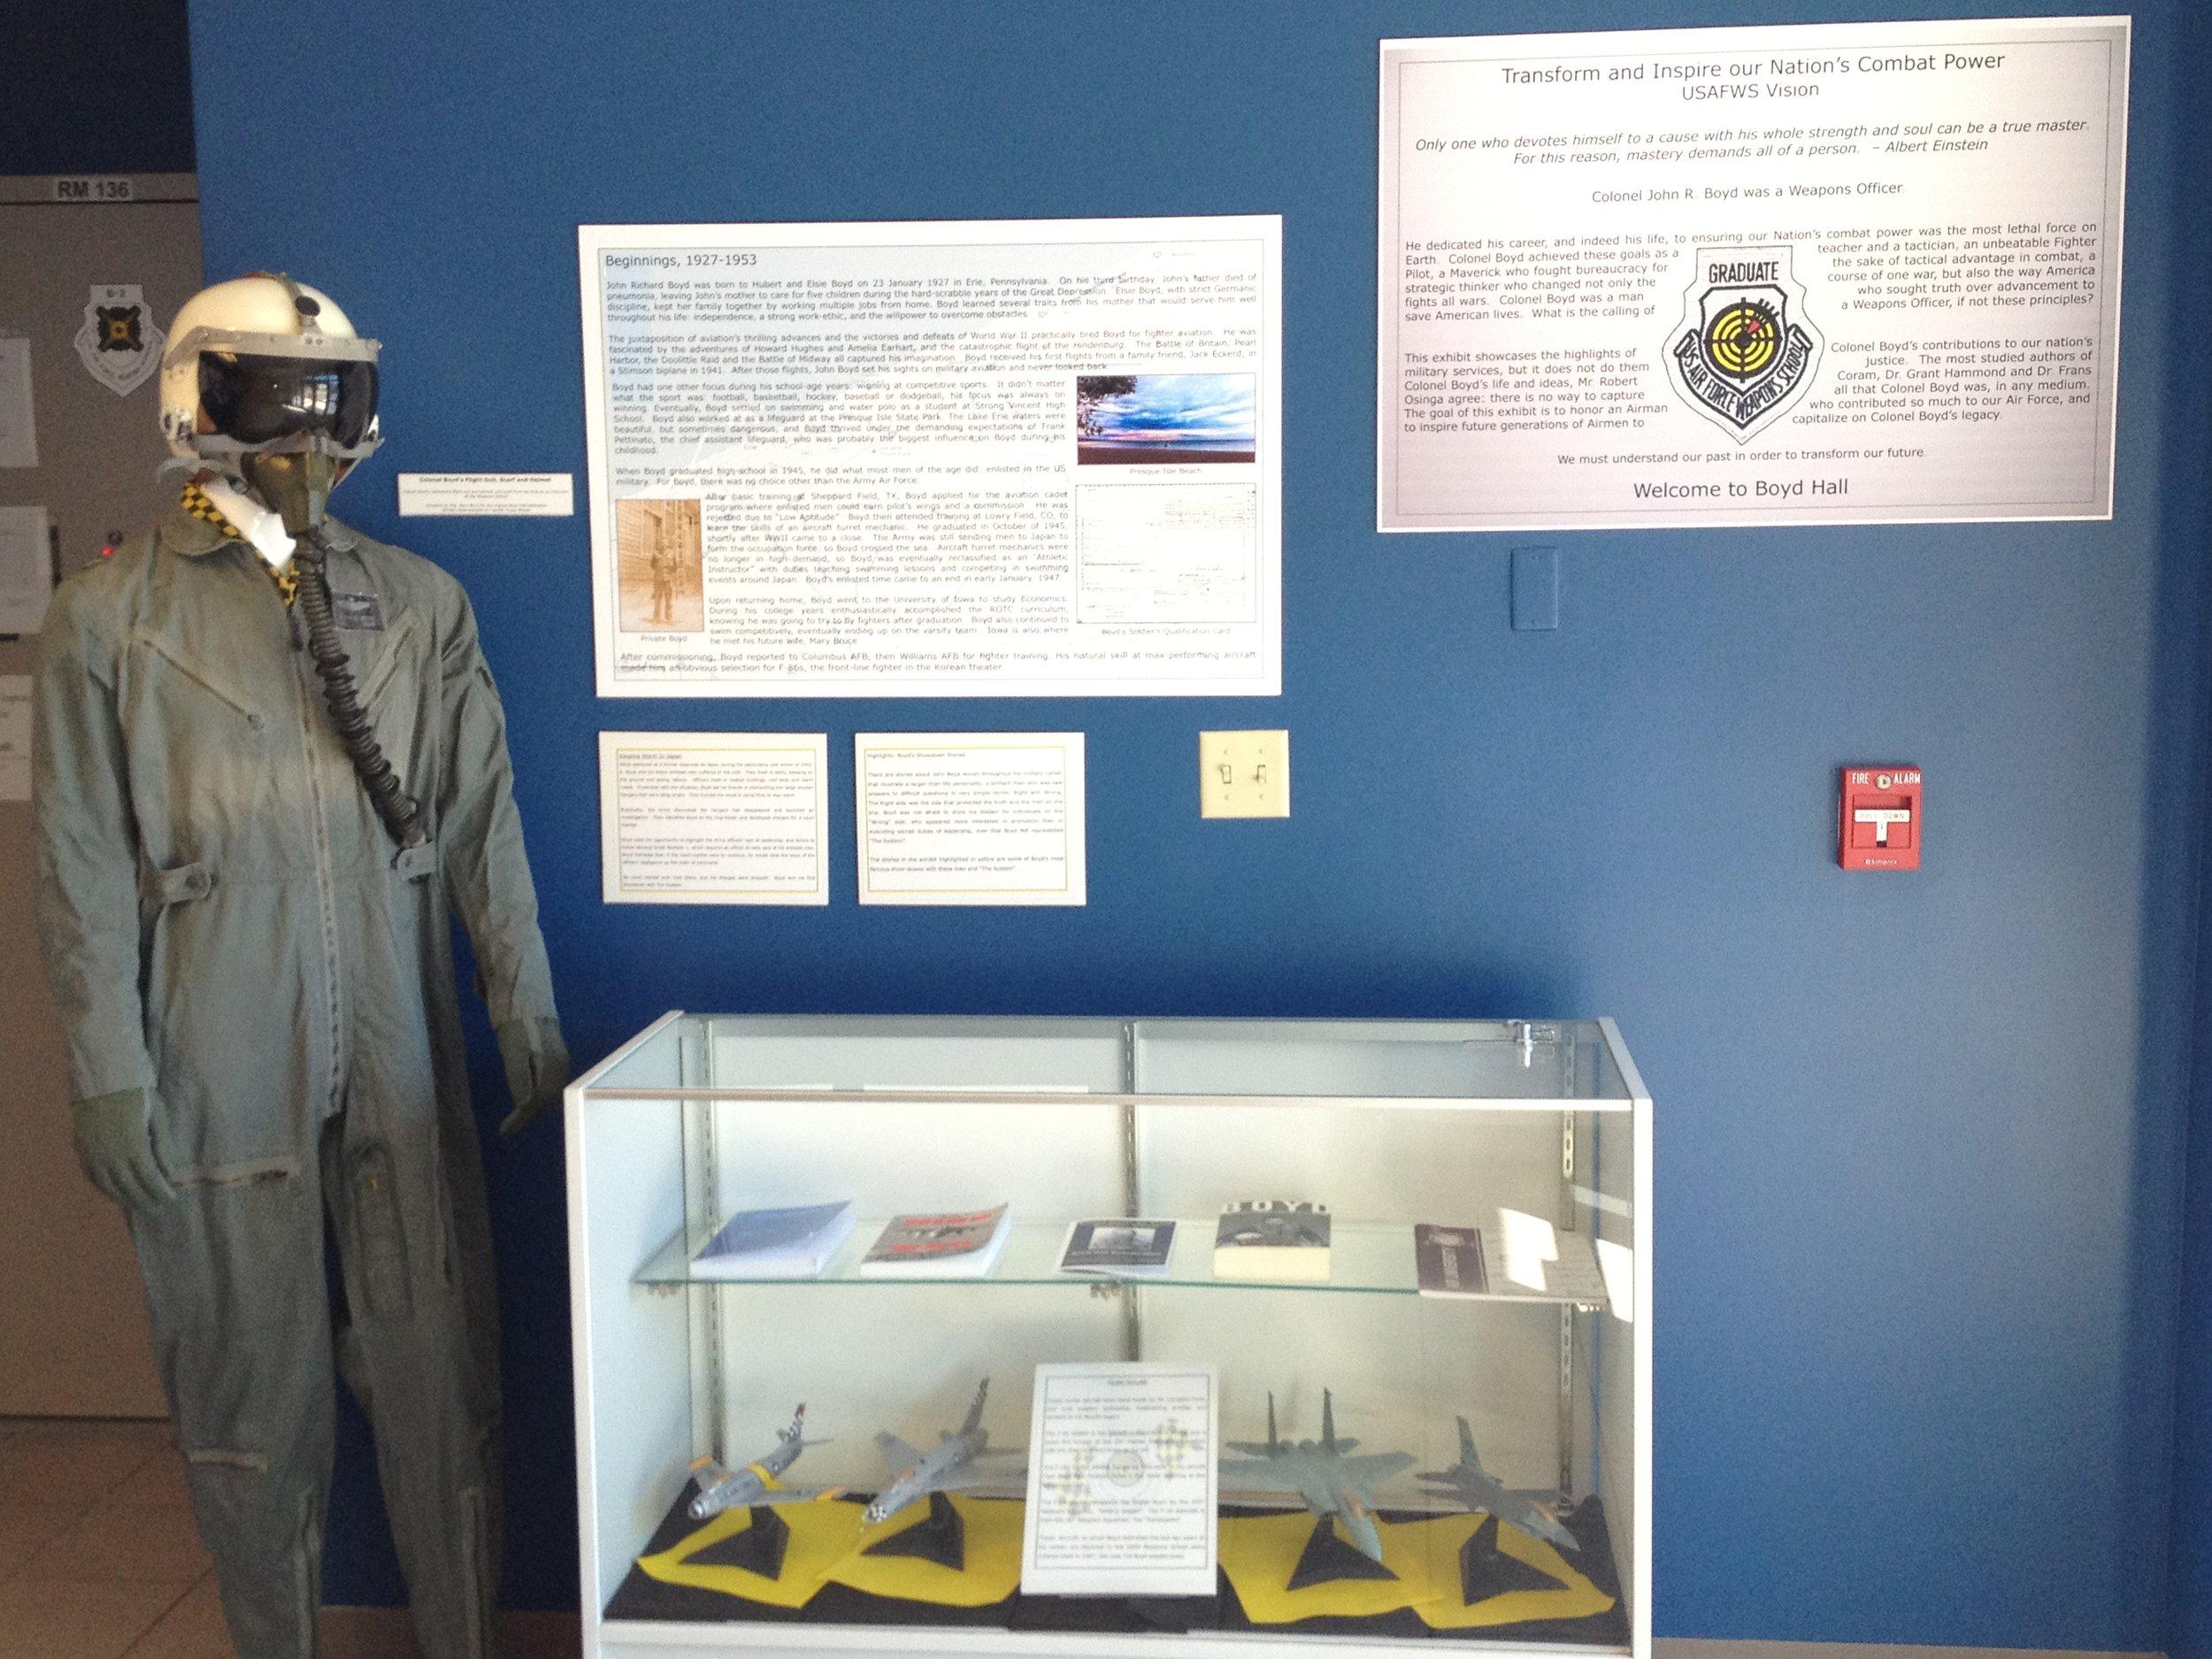 John Boyd's flight suit and helmet at Boyd Hall